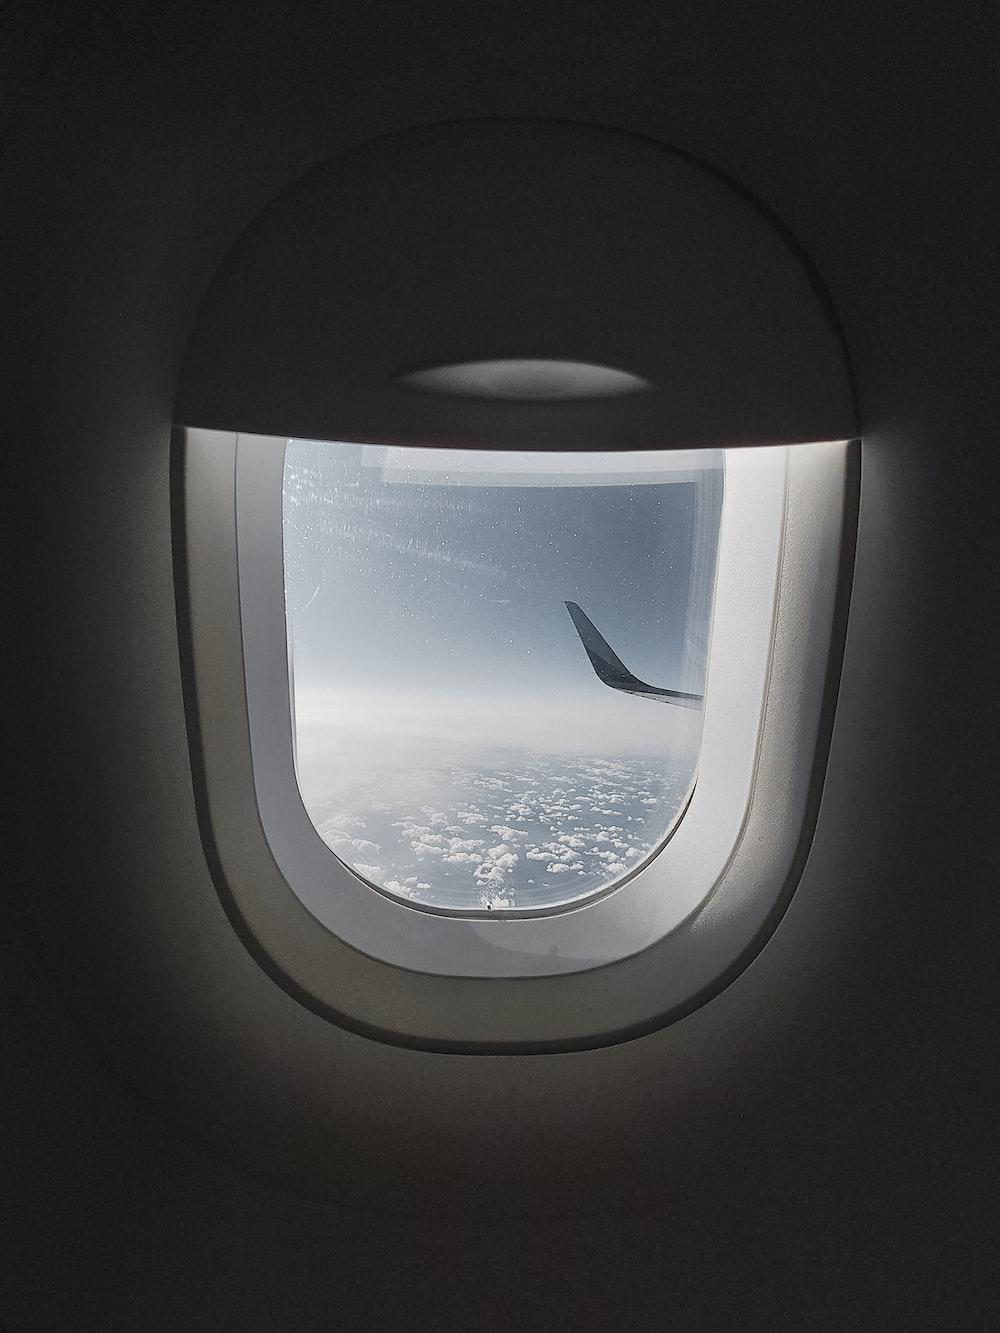 photo of white air plane window